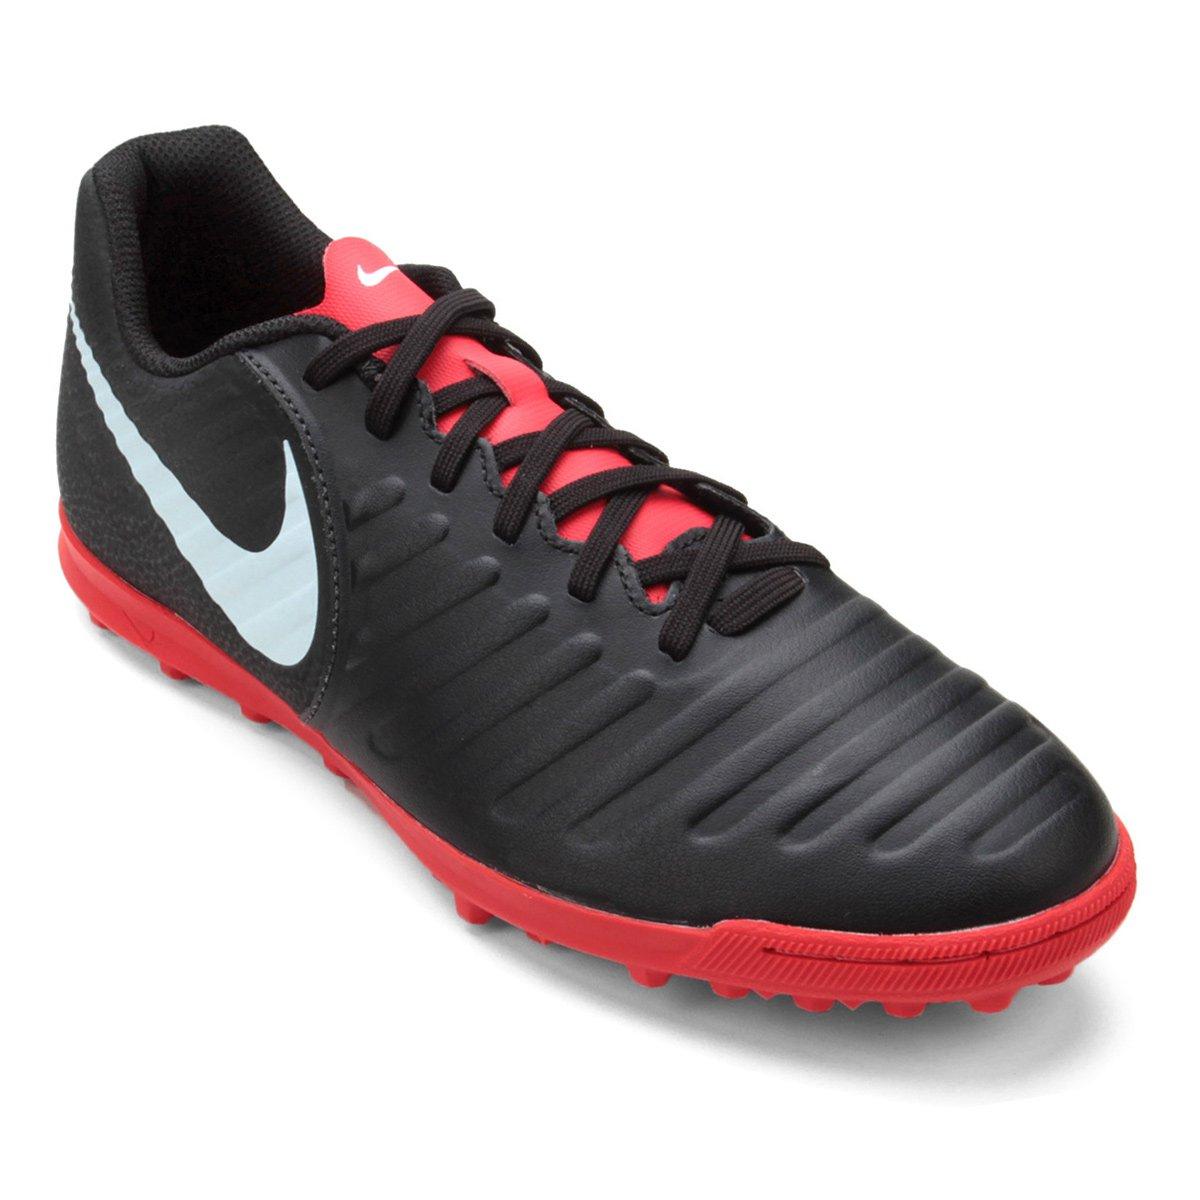 ff01e150c7 Chuteira Society Nike Tiempo Legend 7 Club TF - Preto - Compre Agora ...